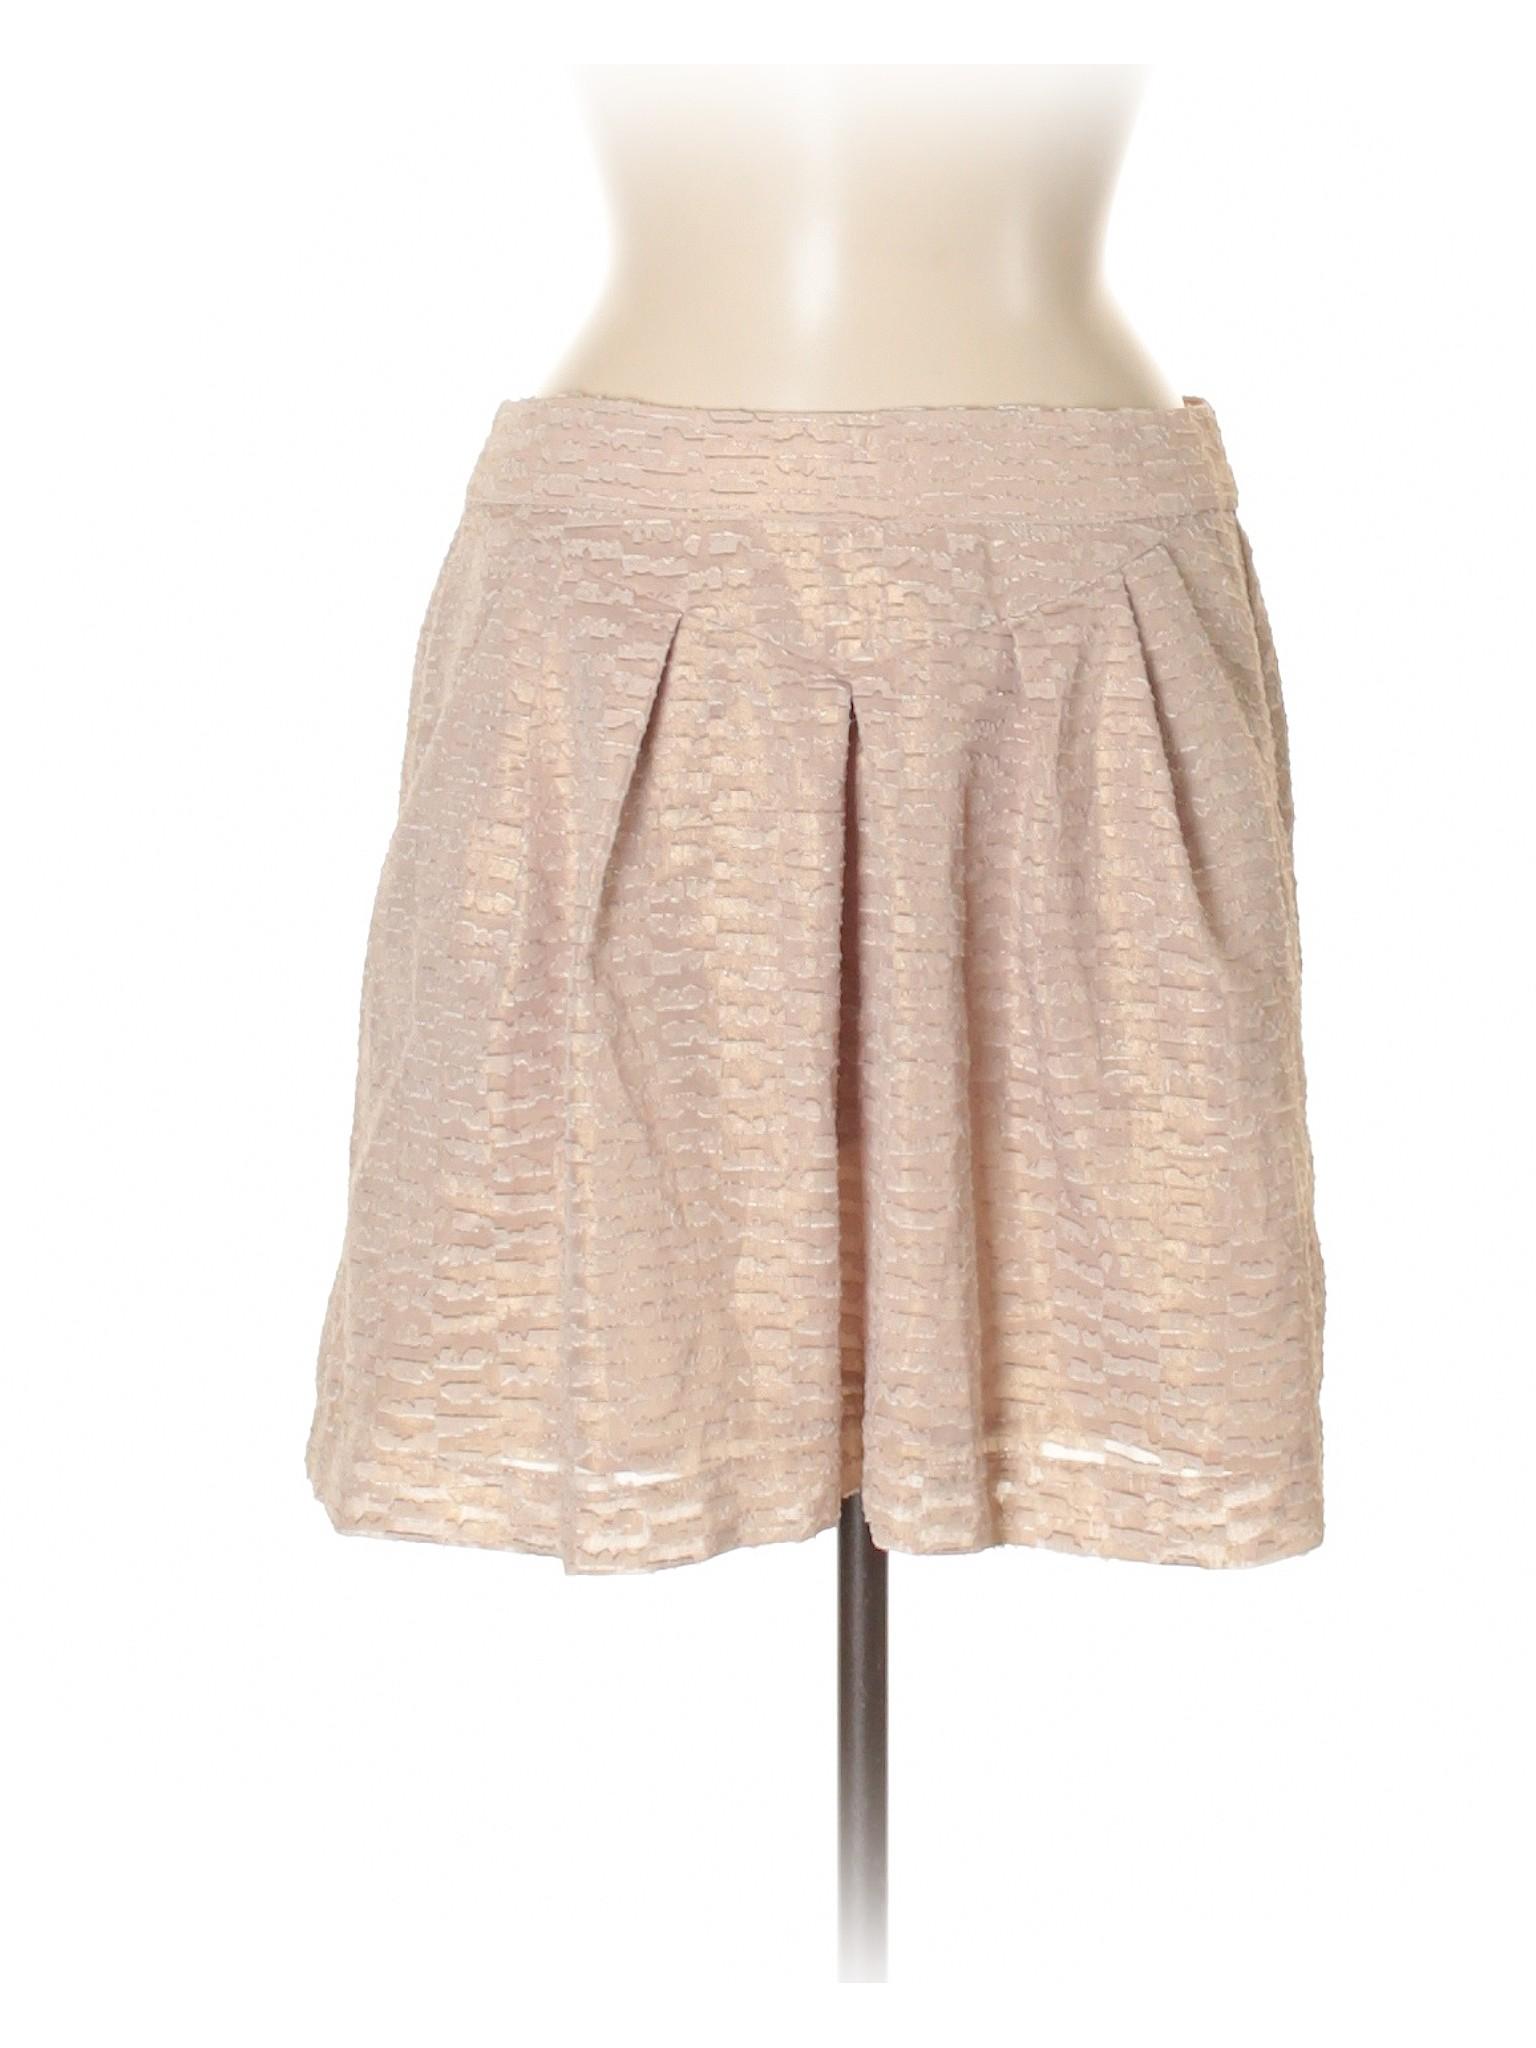 Casual Boutique Boutique Gap leisure leisure Skirt Saq6nq8xd